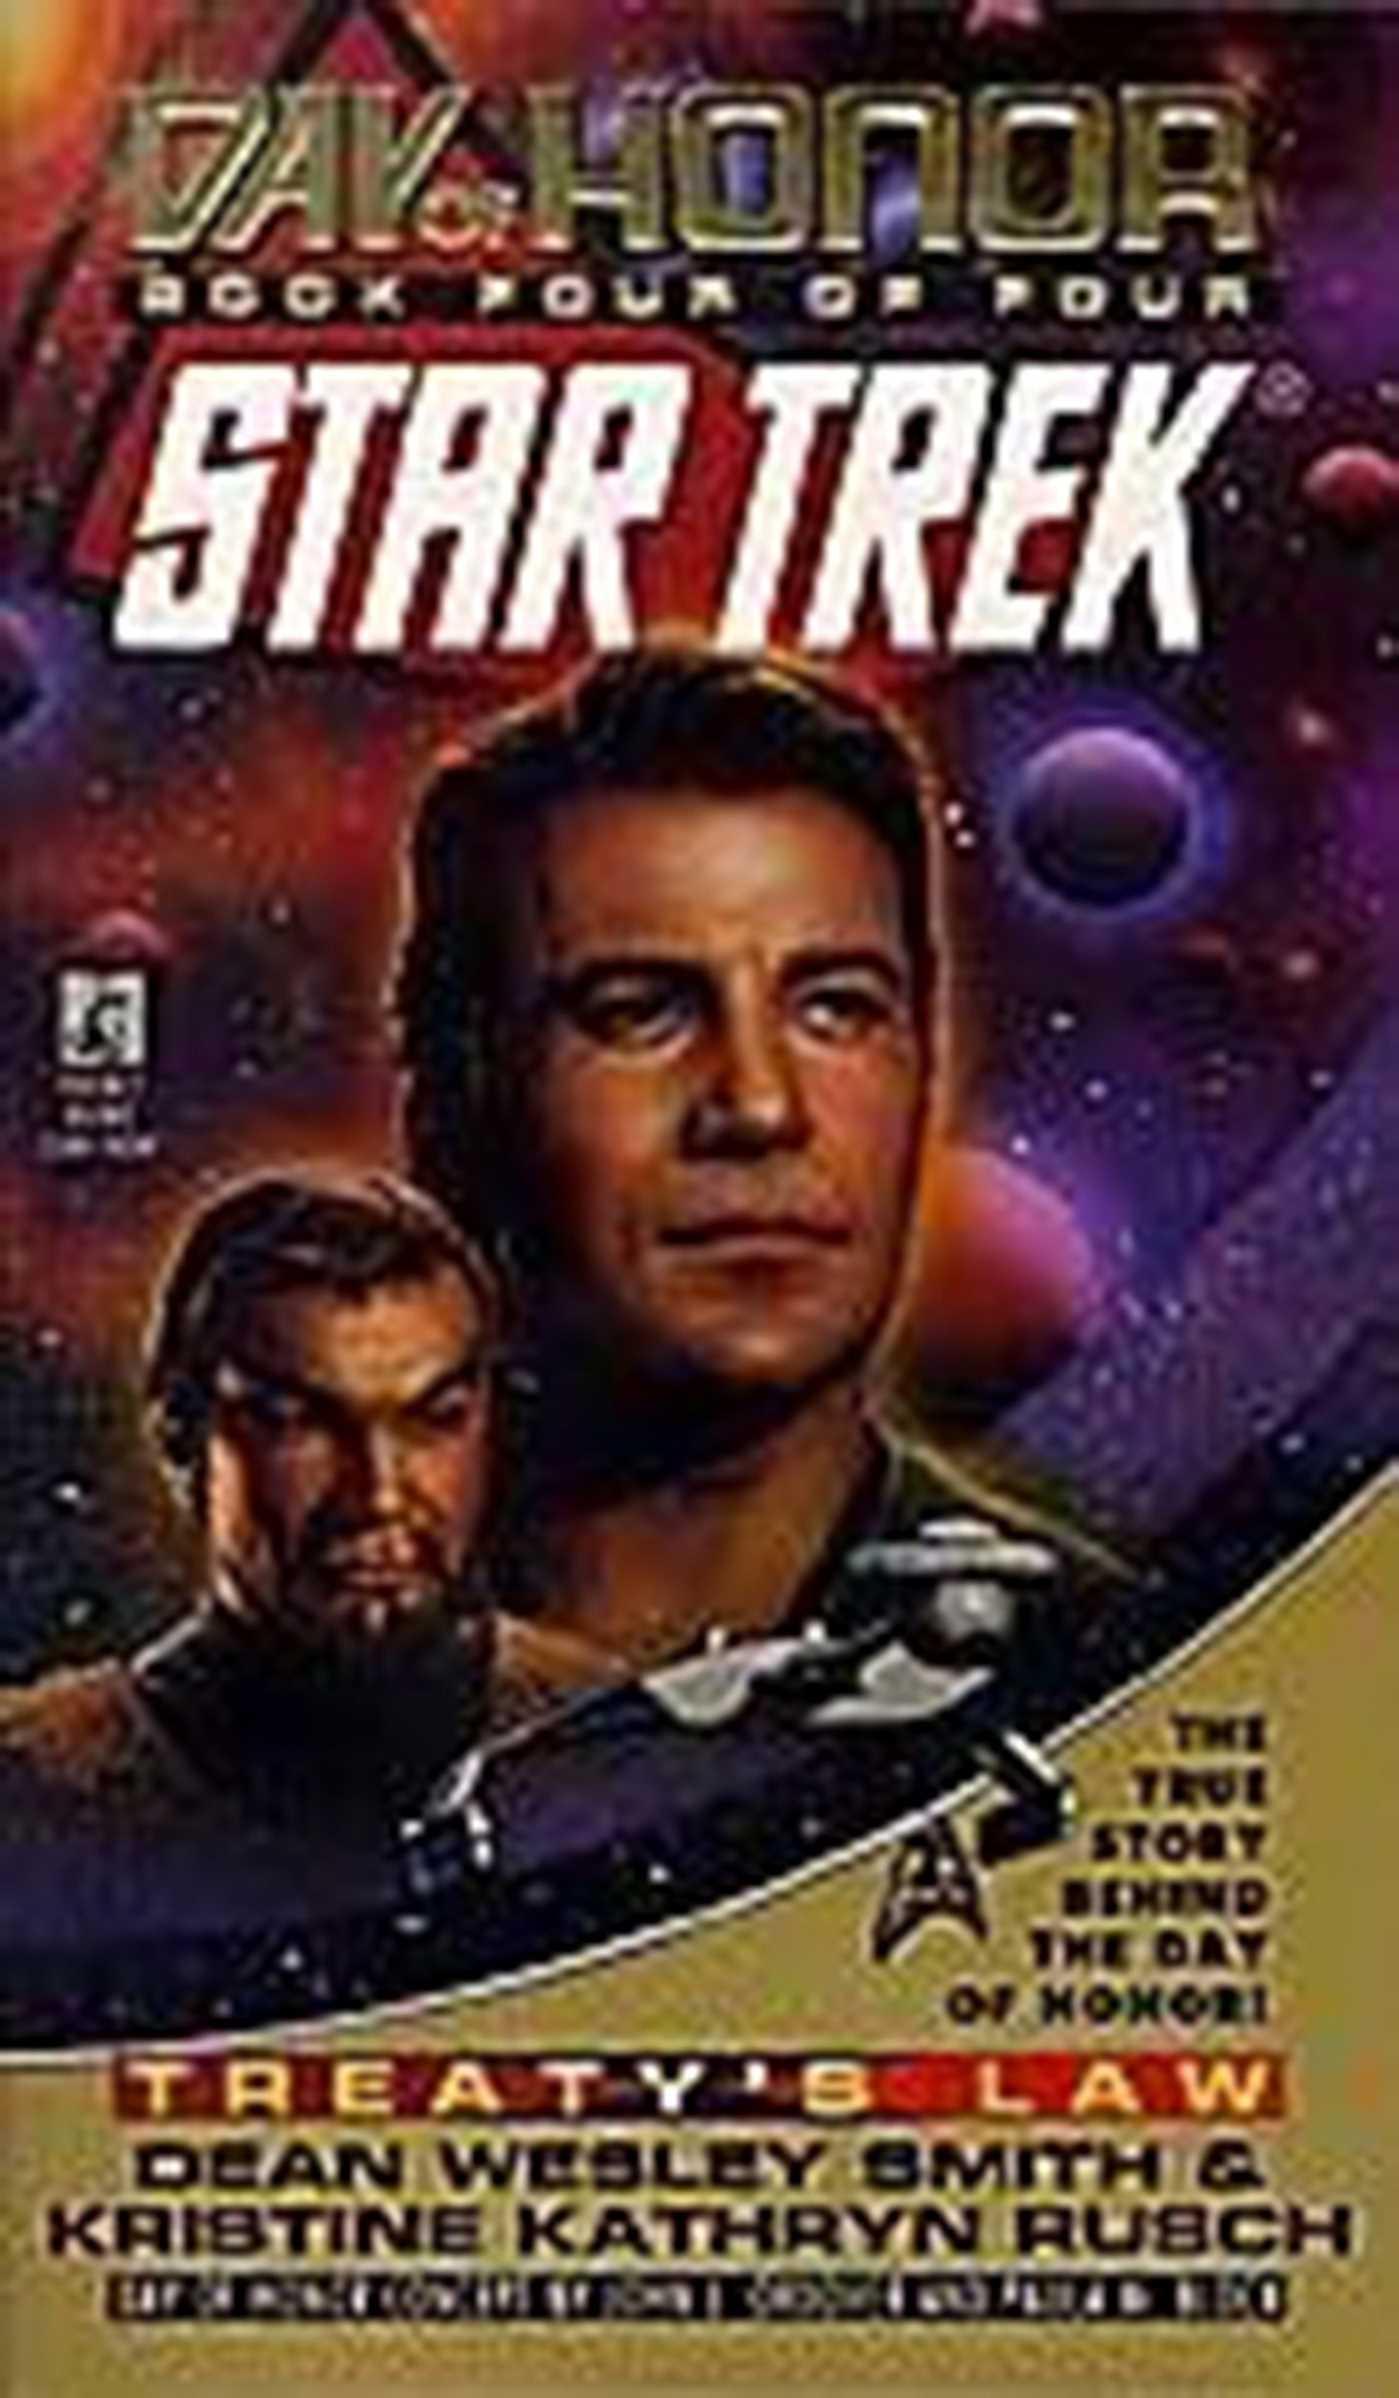 St Tos Day Of Honor #4 Treatys Law (Star Trek)